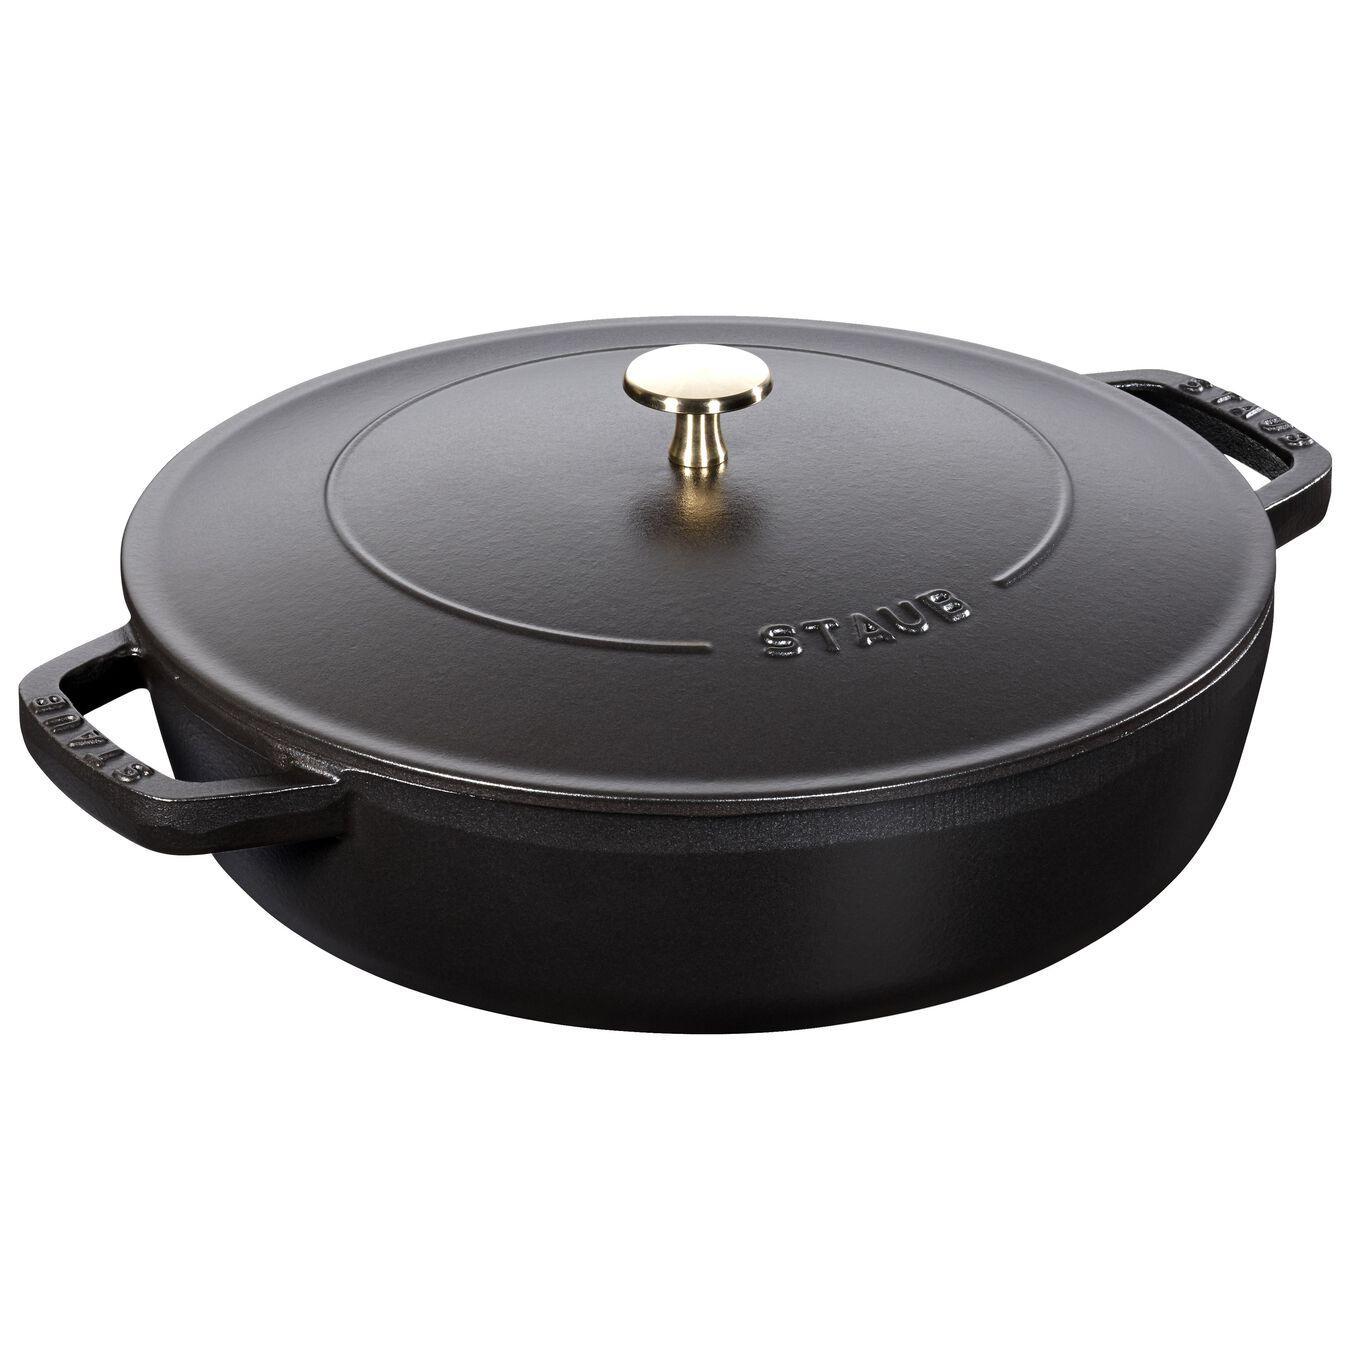 3,75 l Cast iron round Sauteuse Chistera, black,,large 1